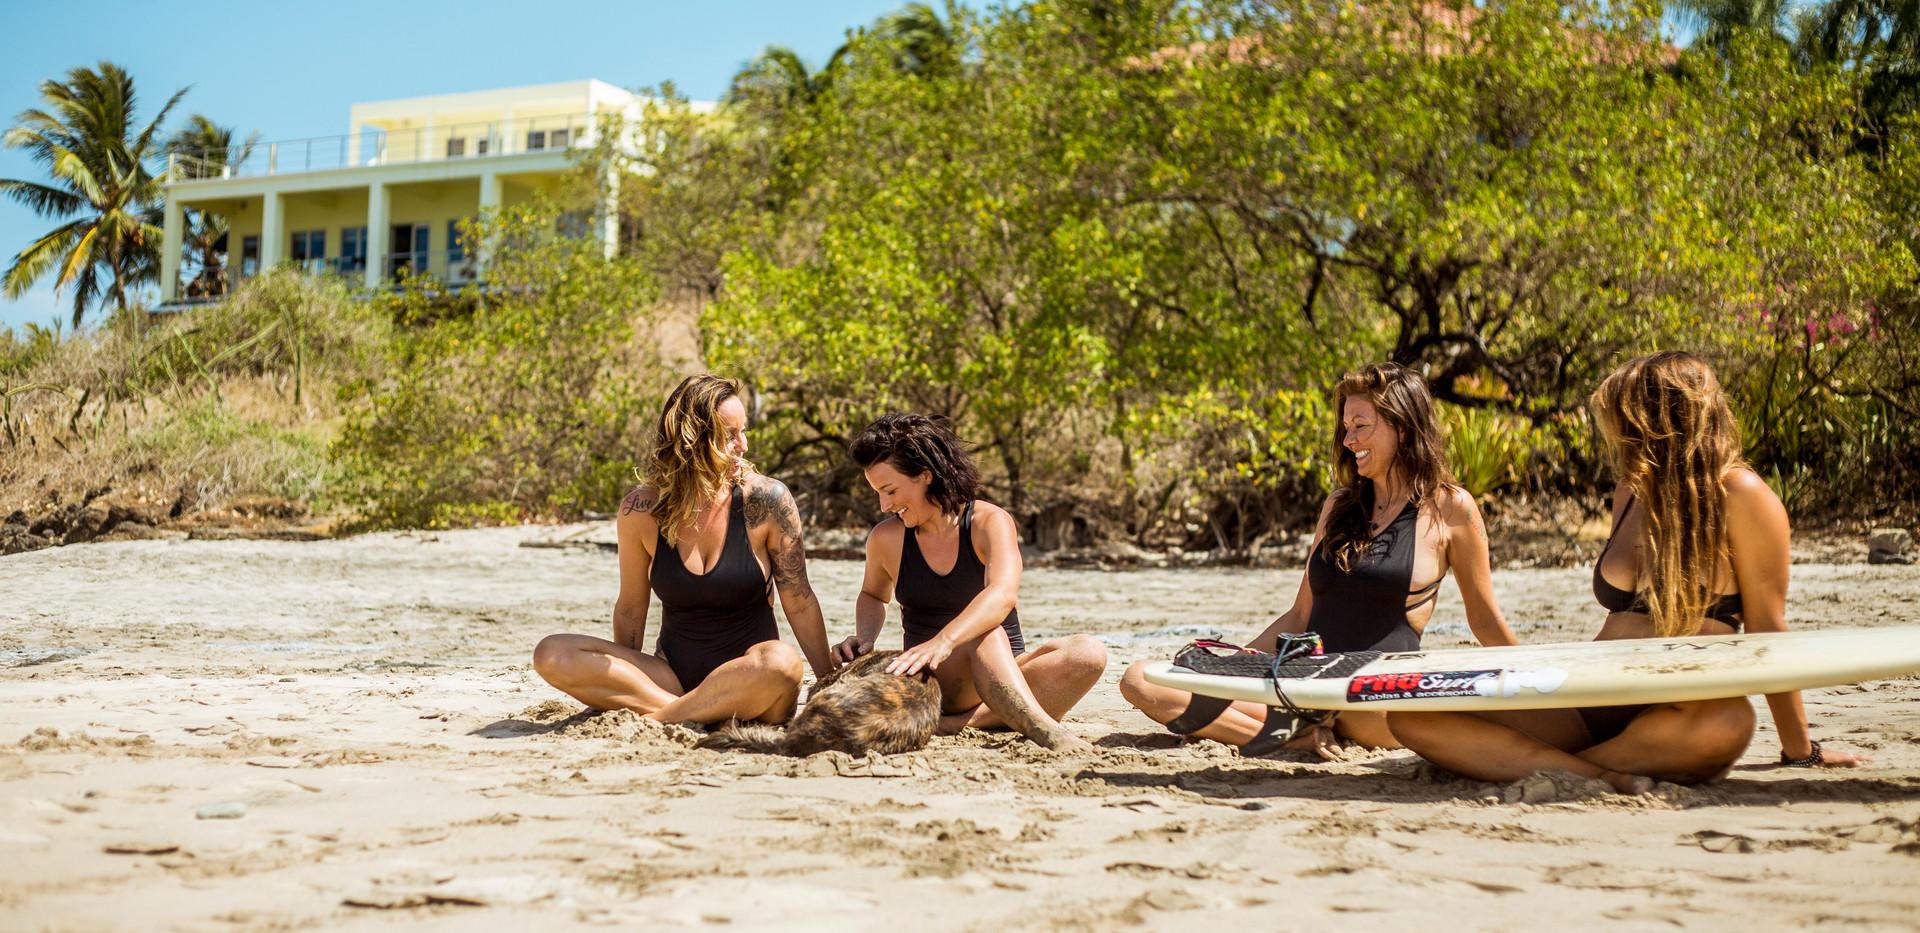 Hali Love Yoga Surf Retreats